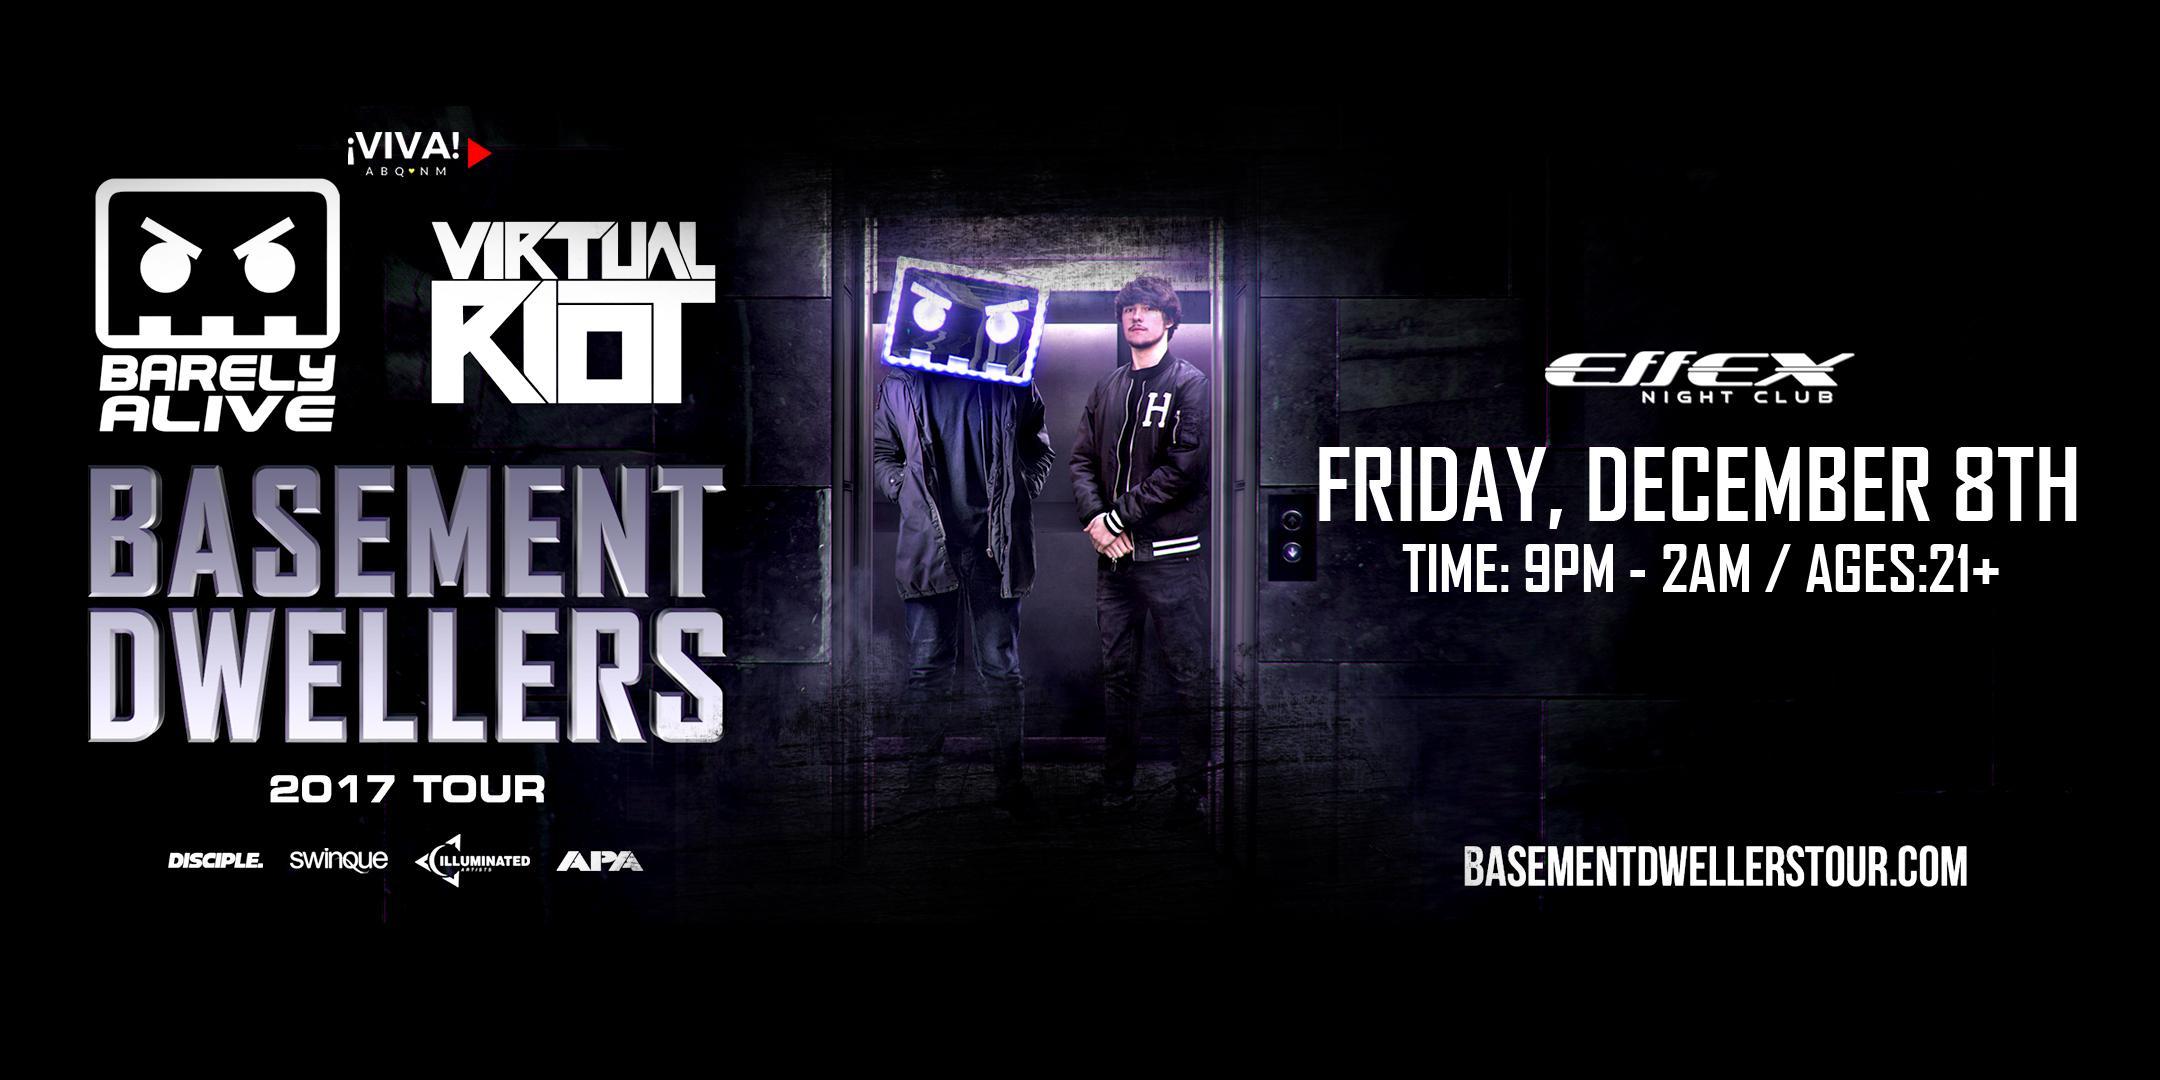 Barely Alive x Virtual Riot: Basement Dwellers Tour (albuquerque, Nm)   Albuquerque, NM   Effex Nightclub   December 8, 2017